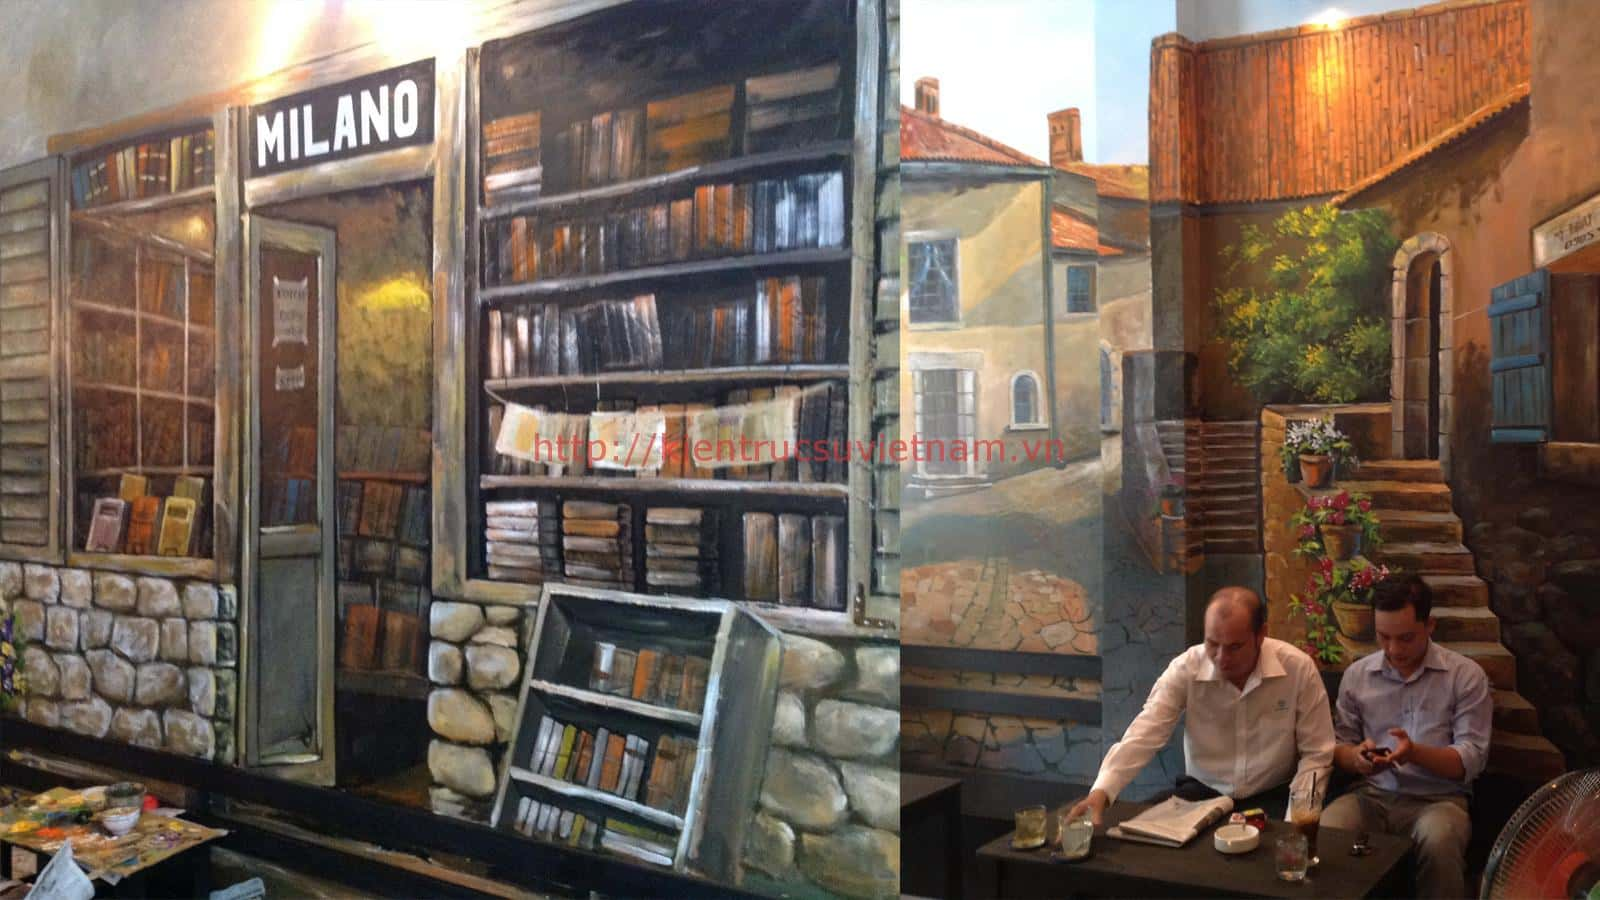 tranh tuong cafe vag 08 - Vẽ tranh tường quán Cafe